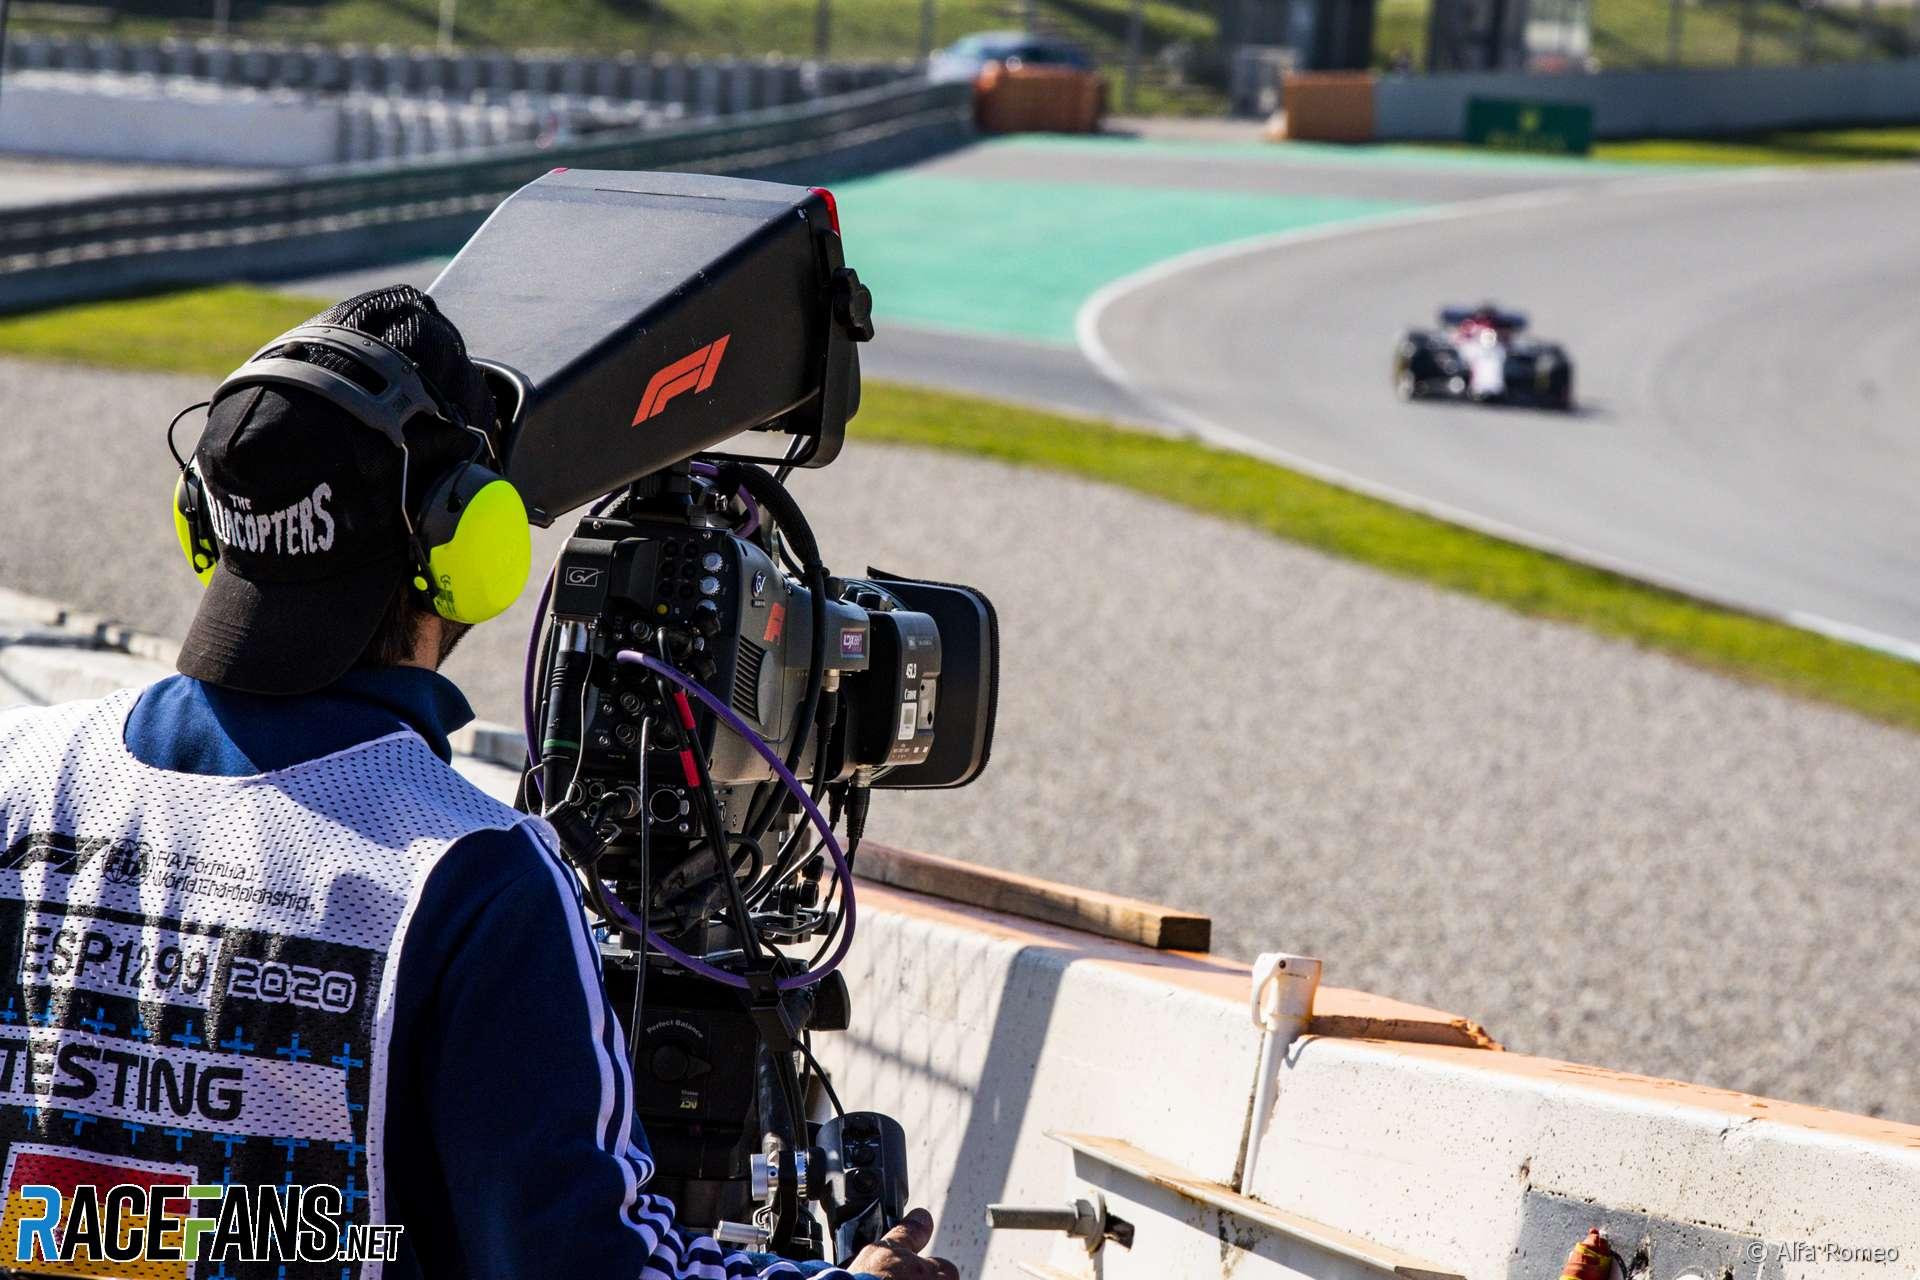 Television camera following Antonio Giovinazzi, Alfa Romeo, Circuit de Catalunya, 2020